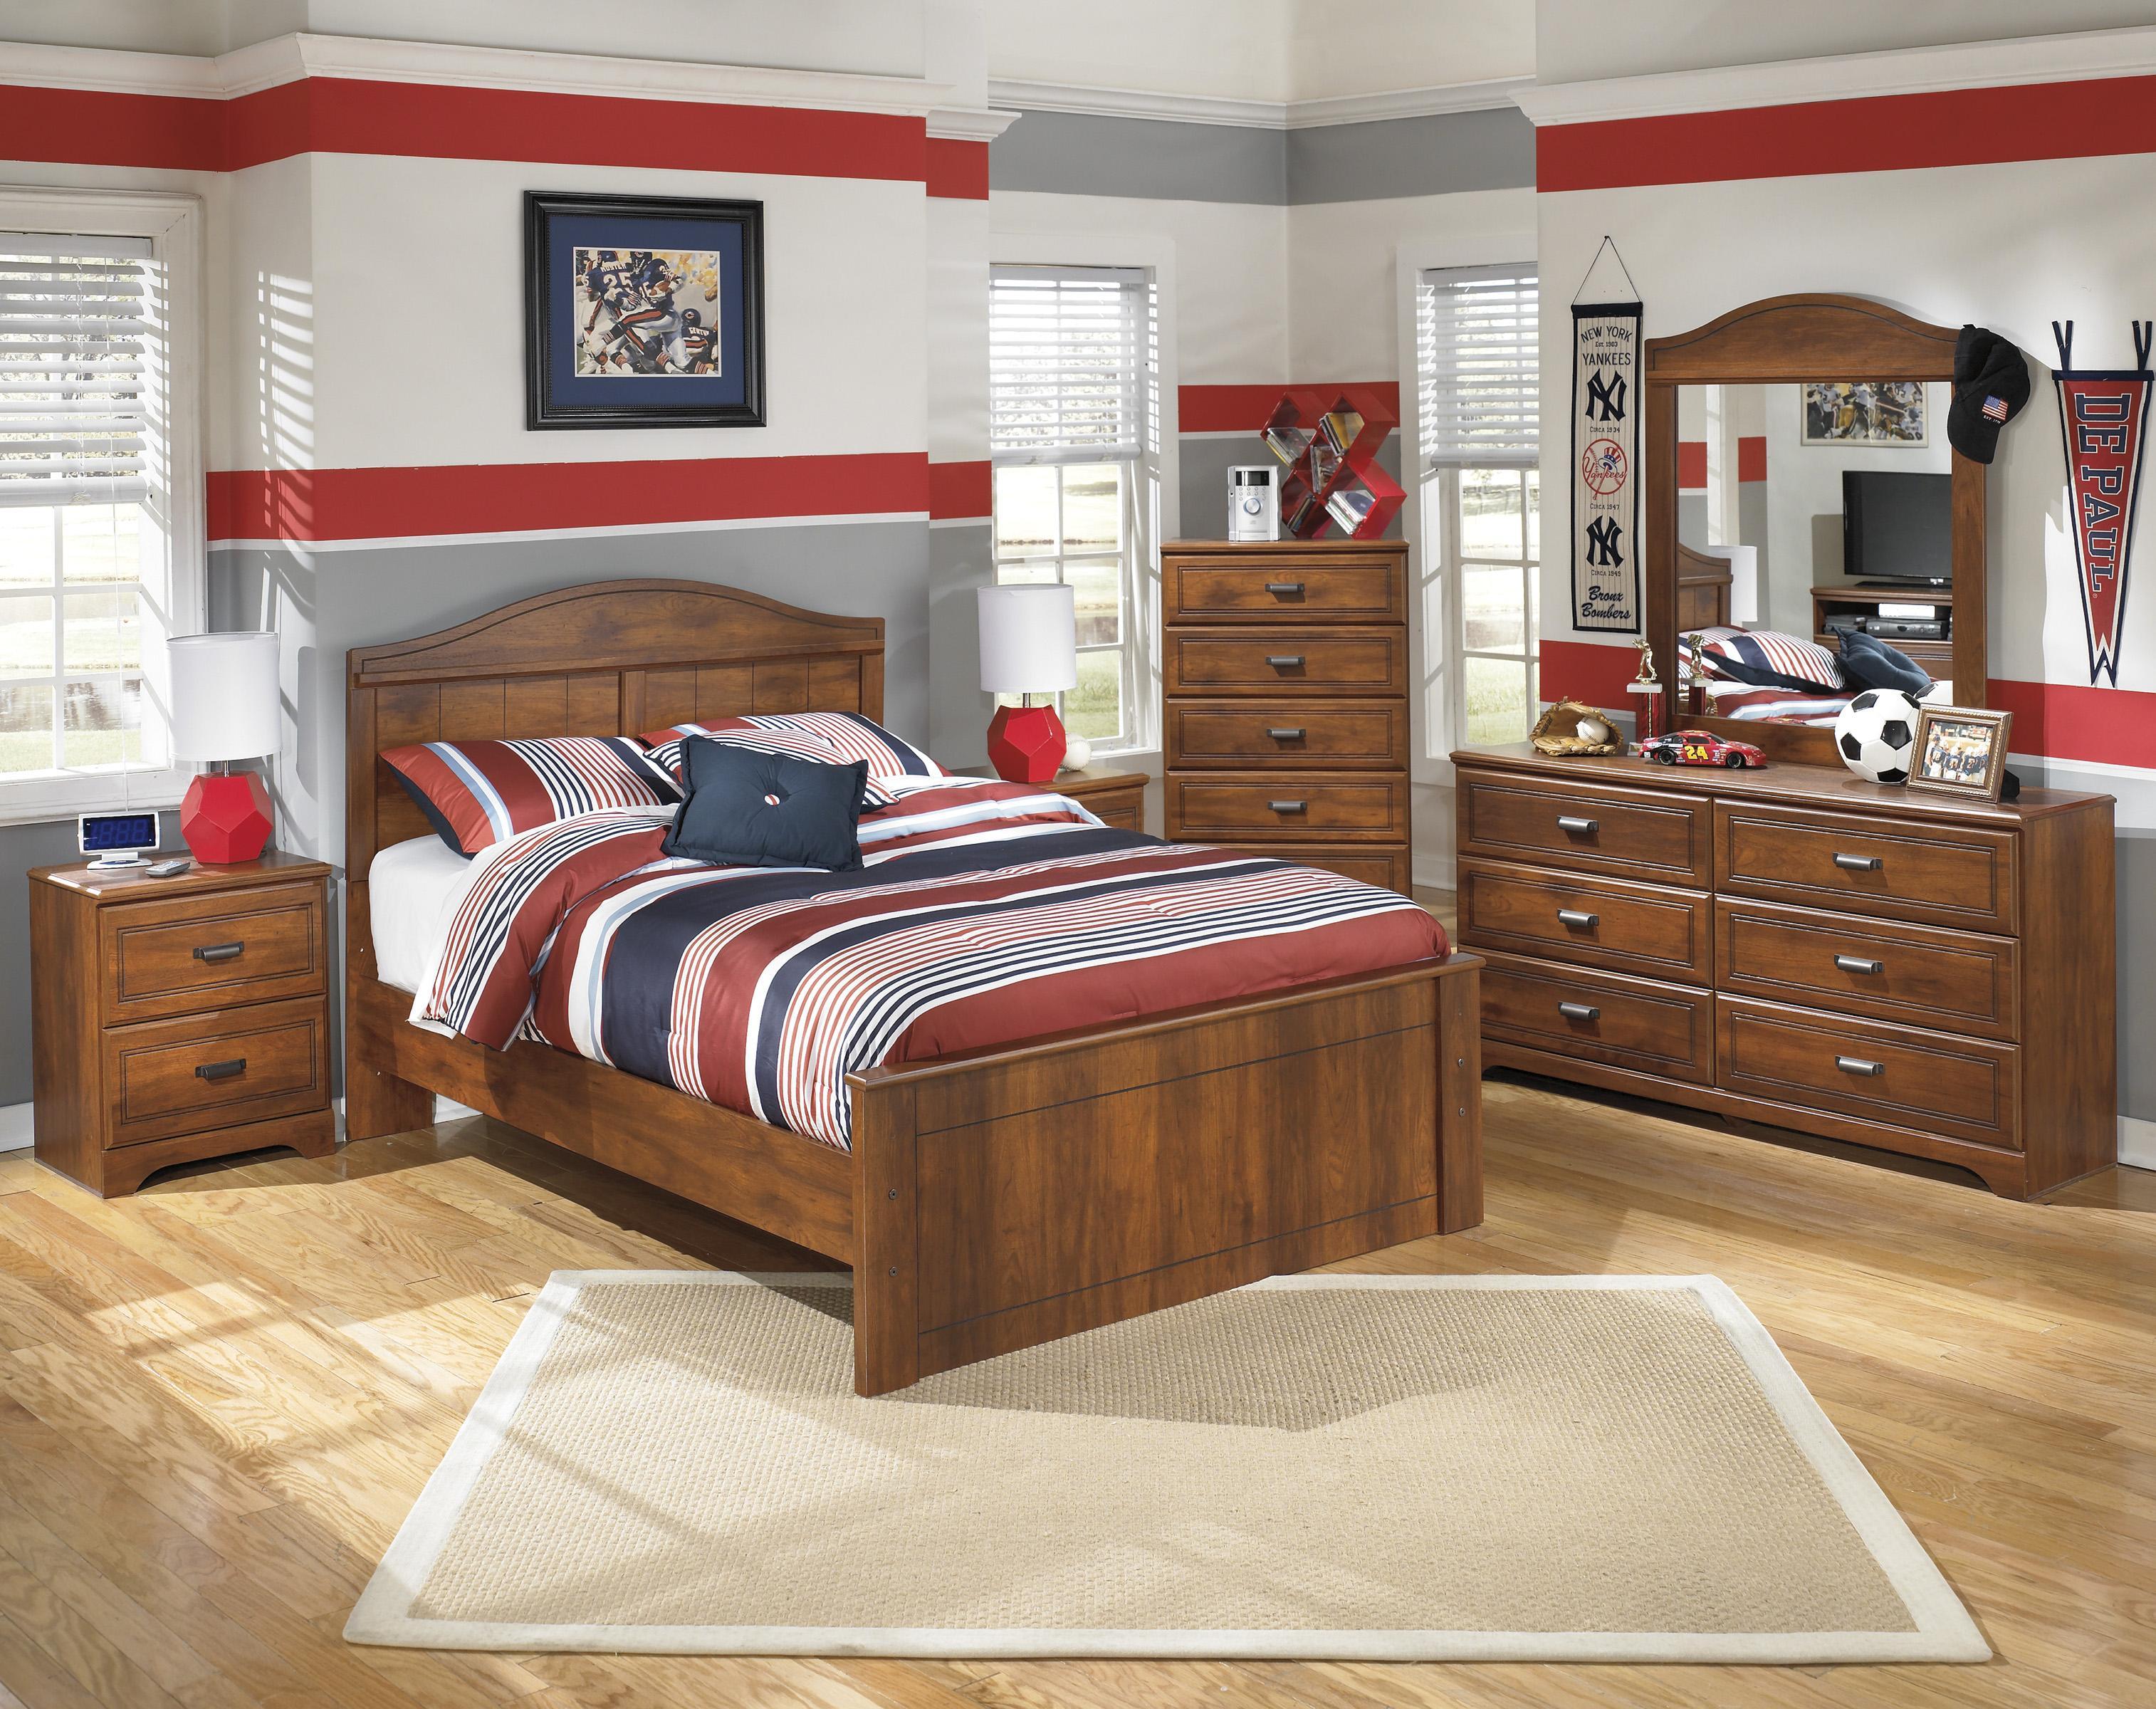 Signature Design By Ashley Barchan Full Bedroom Group Olinde 39 S Furniture Bedroom Group